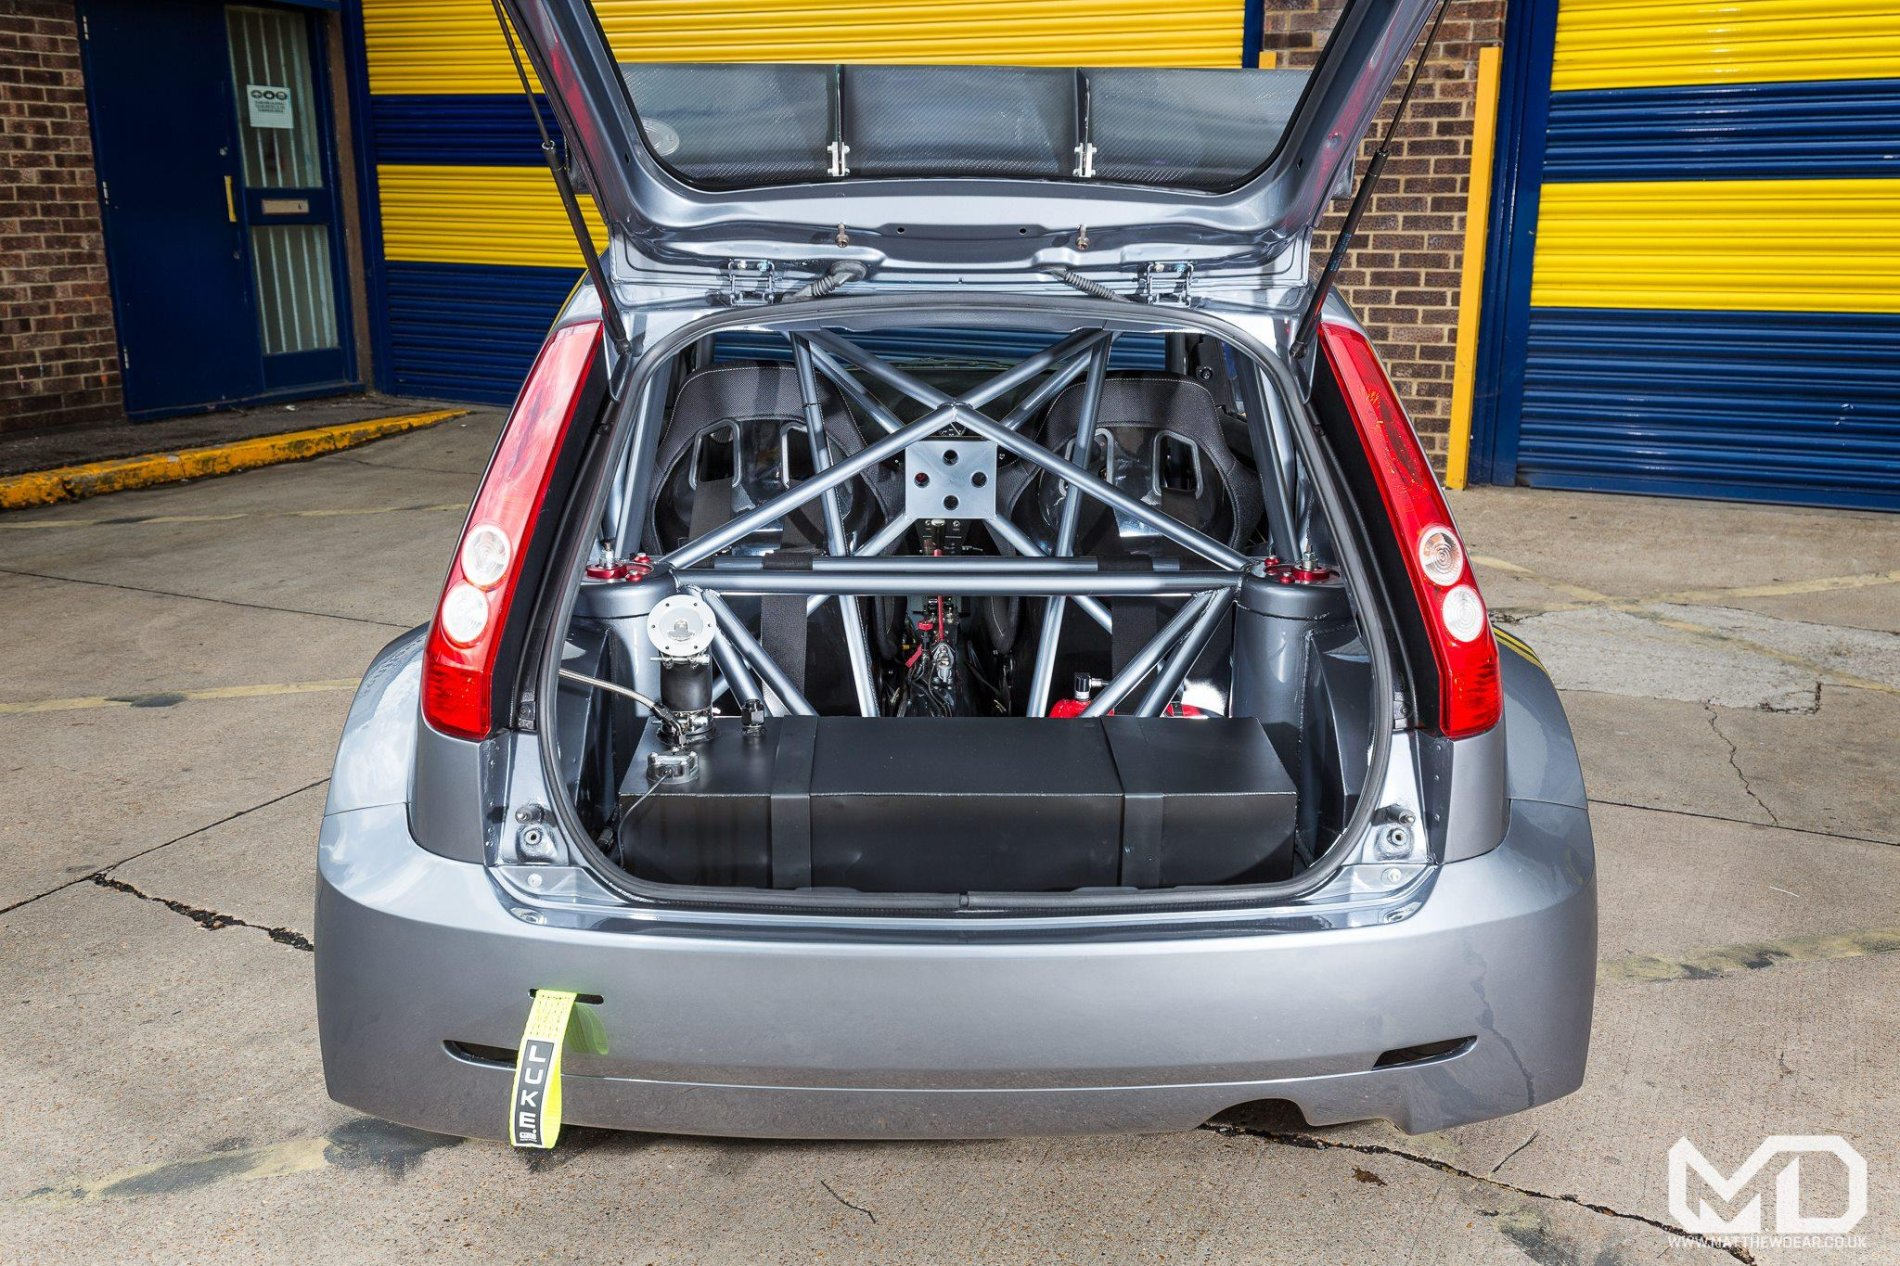 Ford Fiesta cu motor Cosworth si tractiune integrala - Ford Fiesta cu motor Cosworth si tractiune integrala